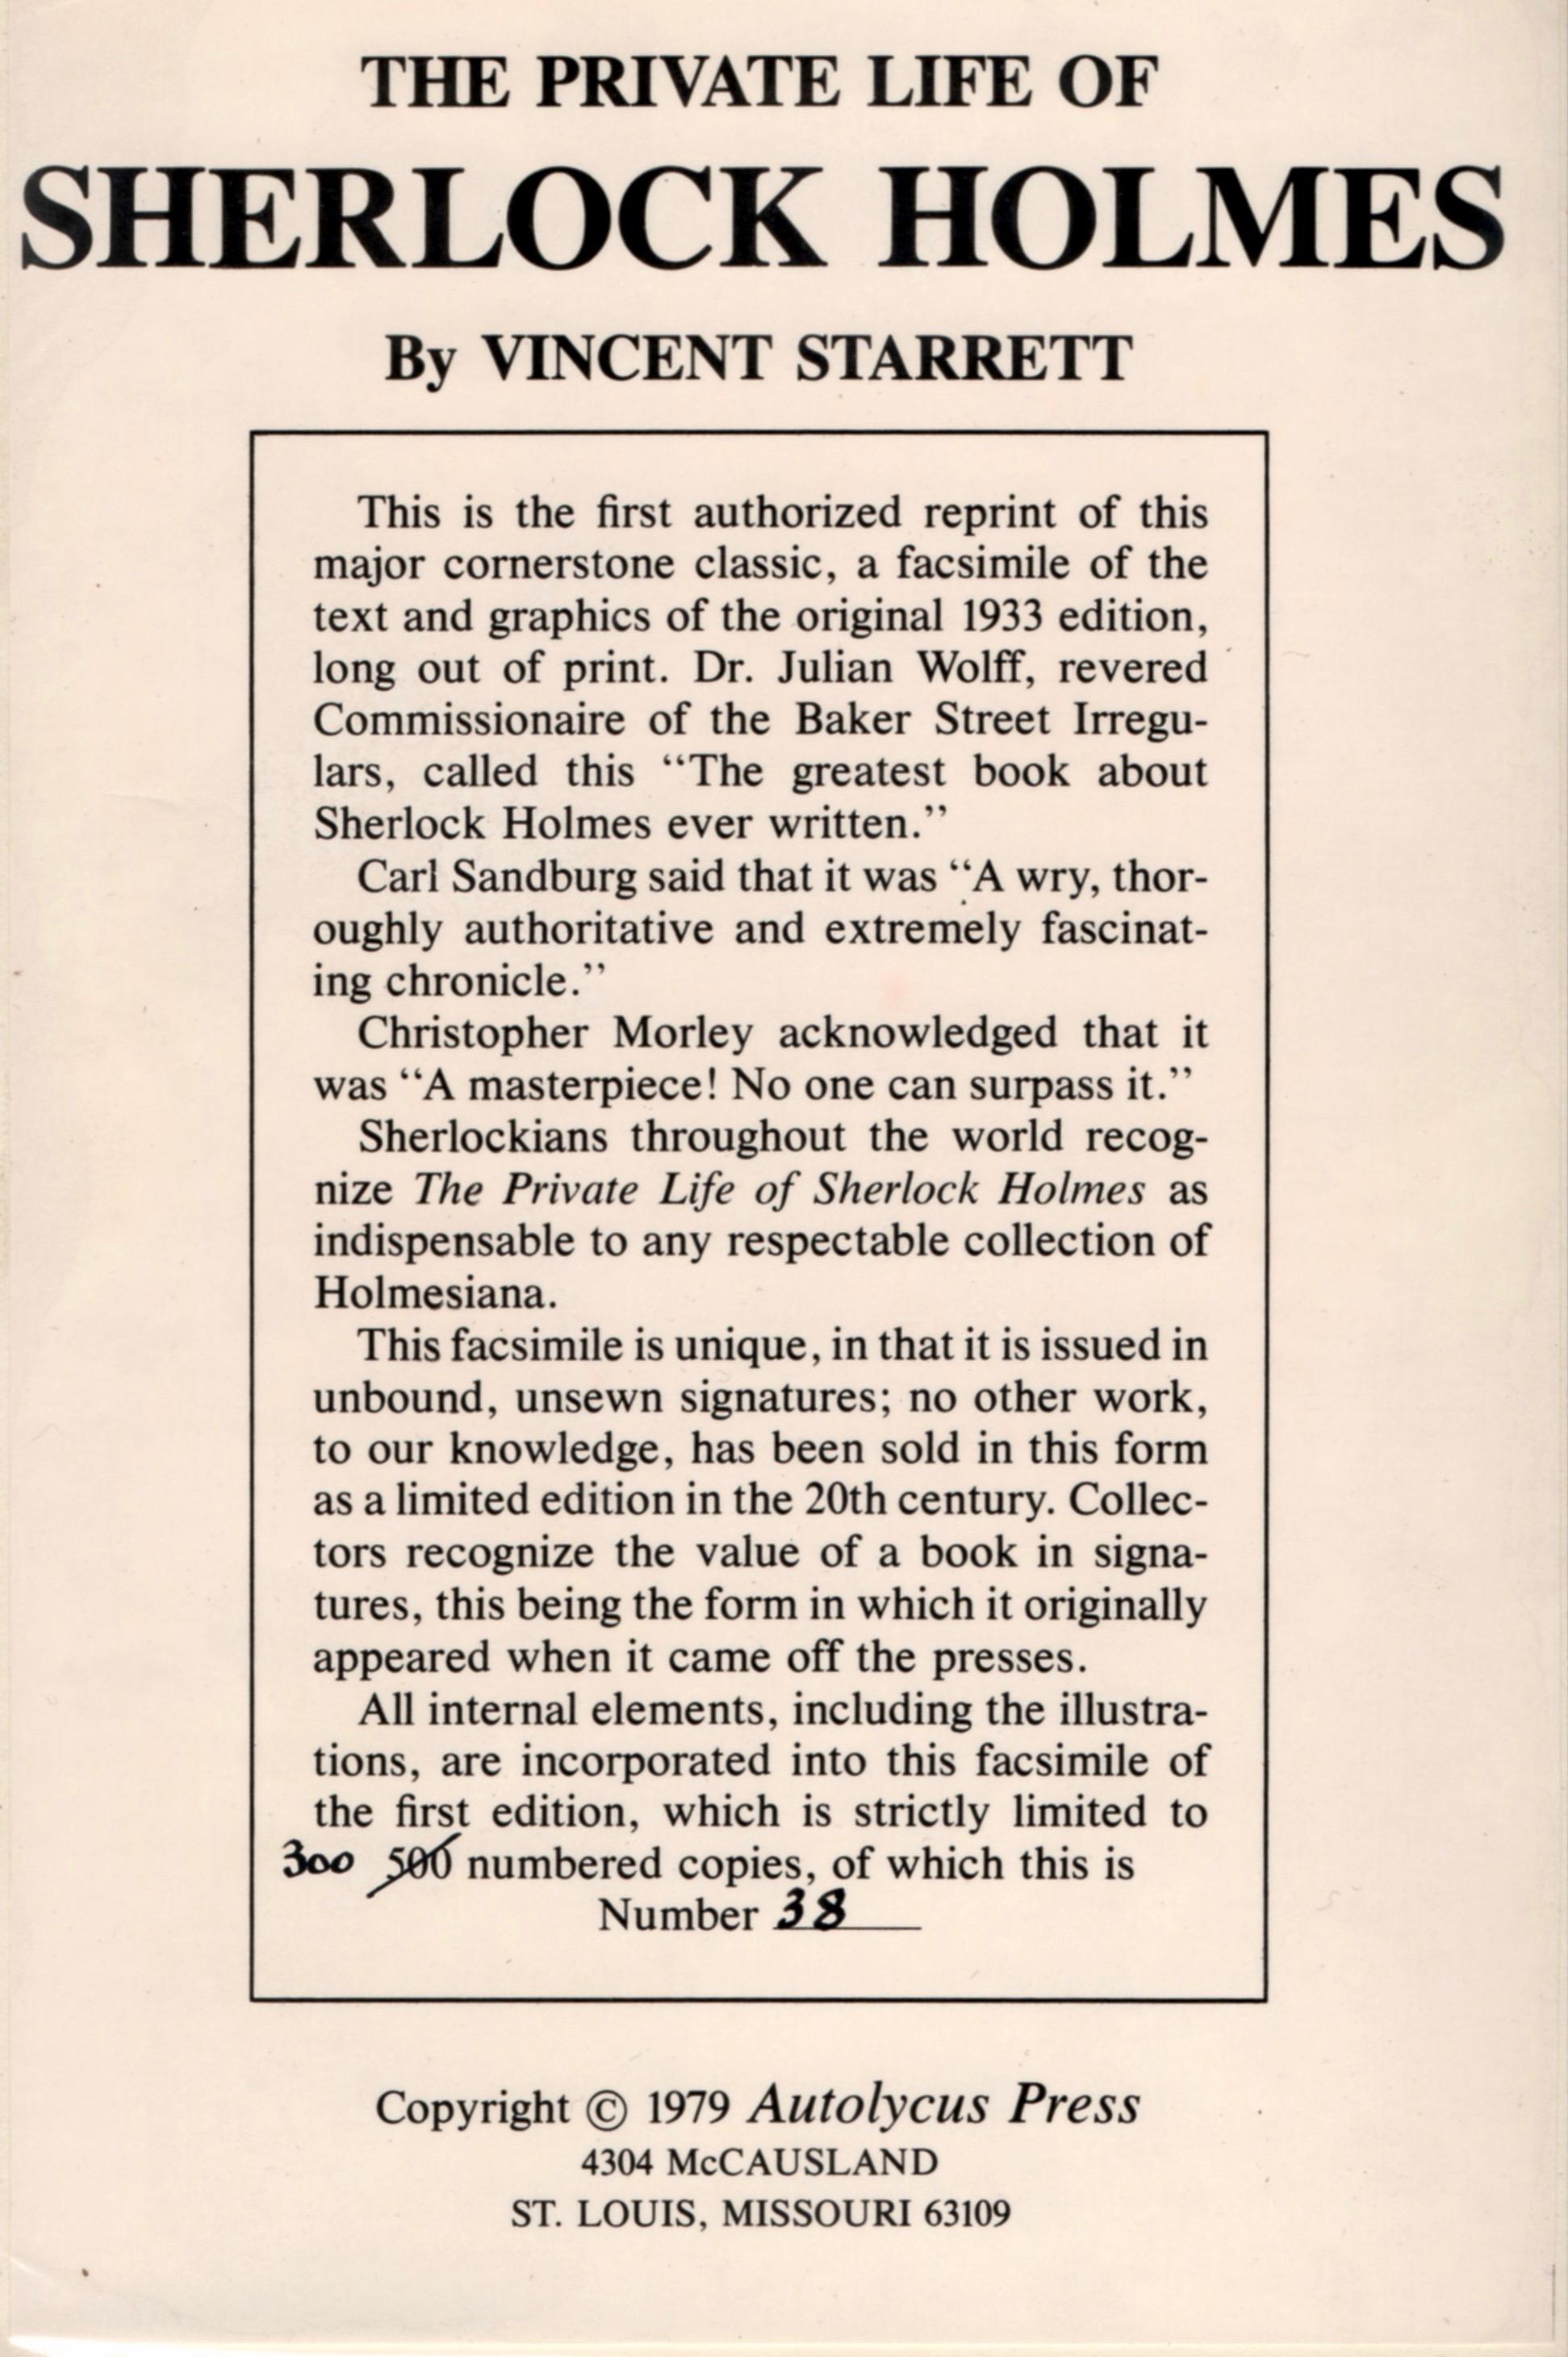 TPLOSH '79 cover sheet.jpeg